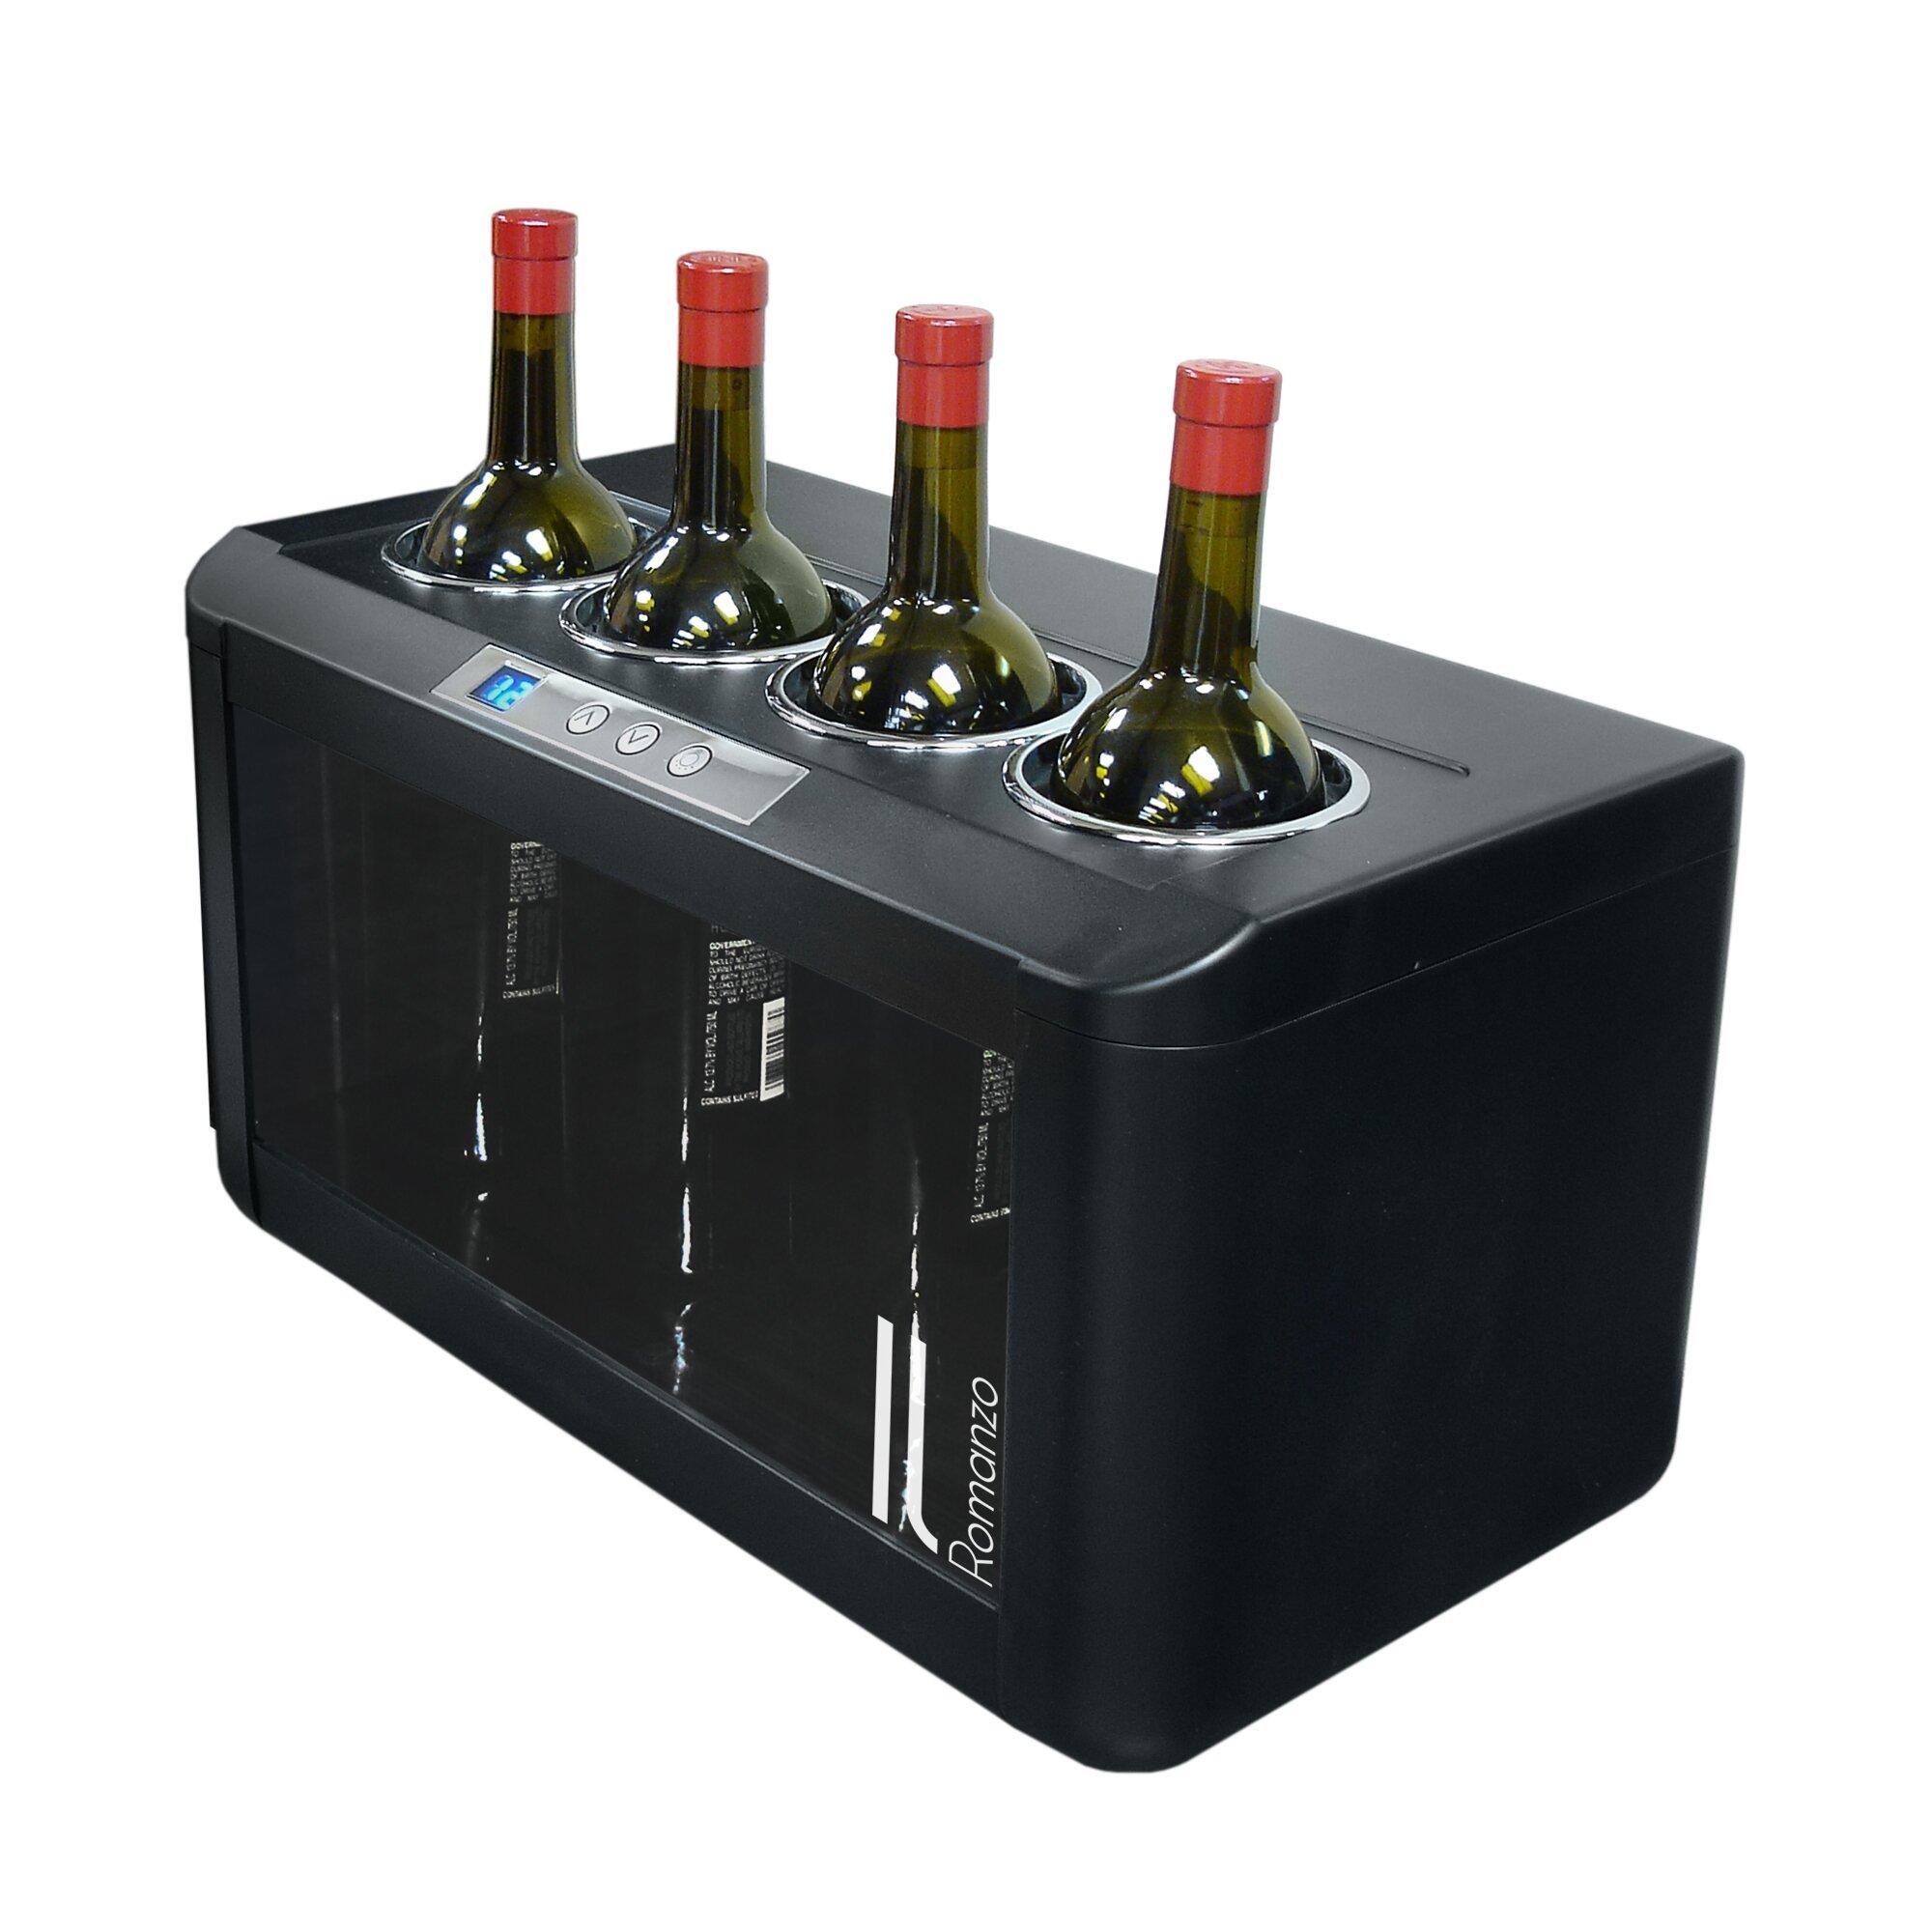 Vinotemp Il Romanzo 4 Bottle Single Zone Freestanding Wine